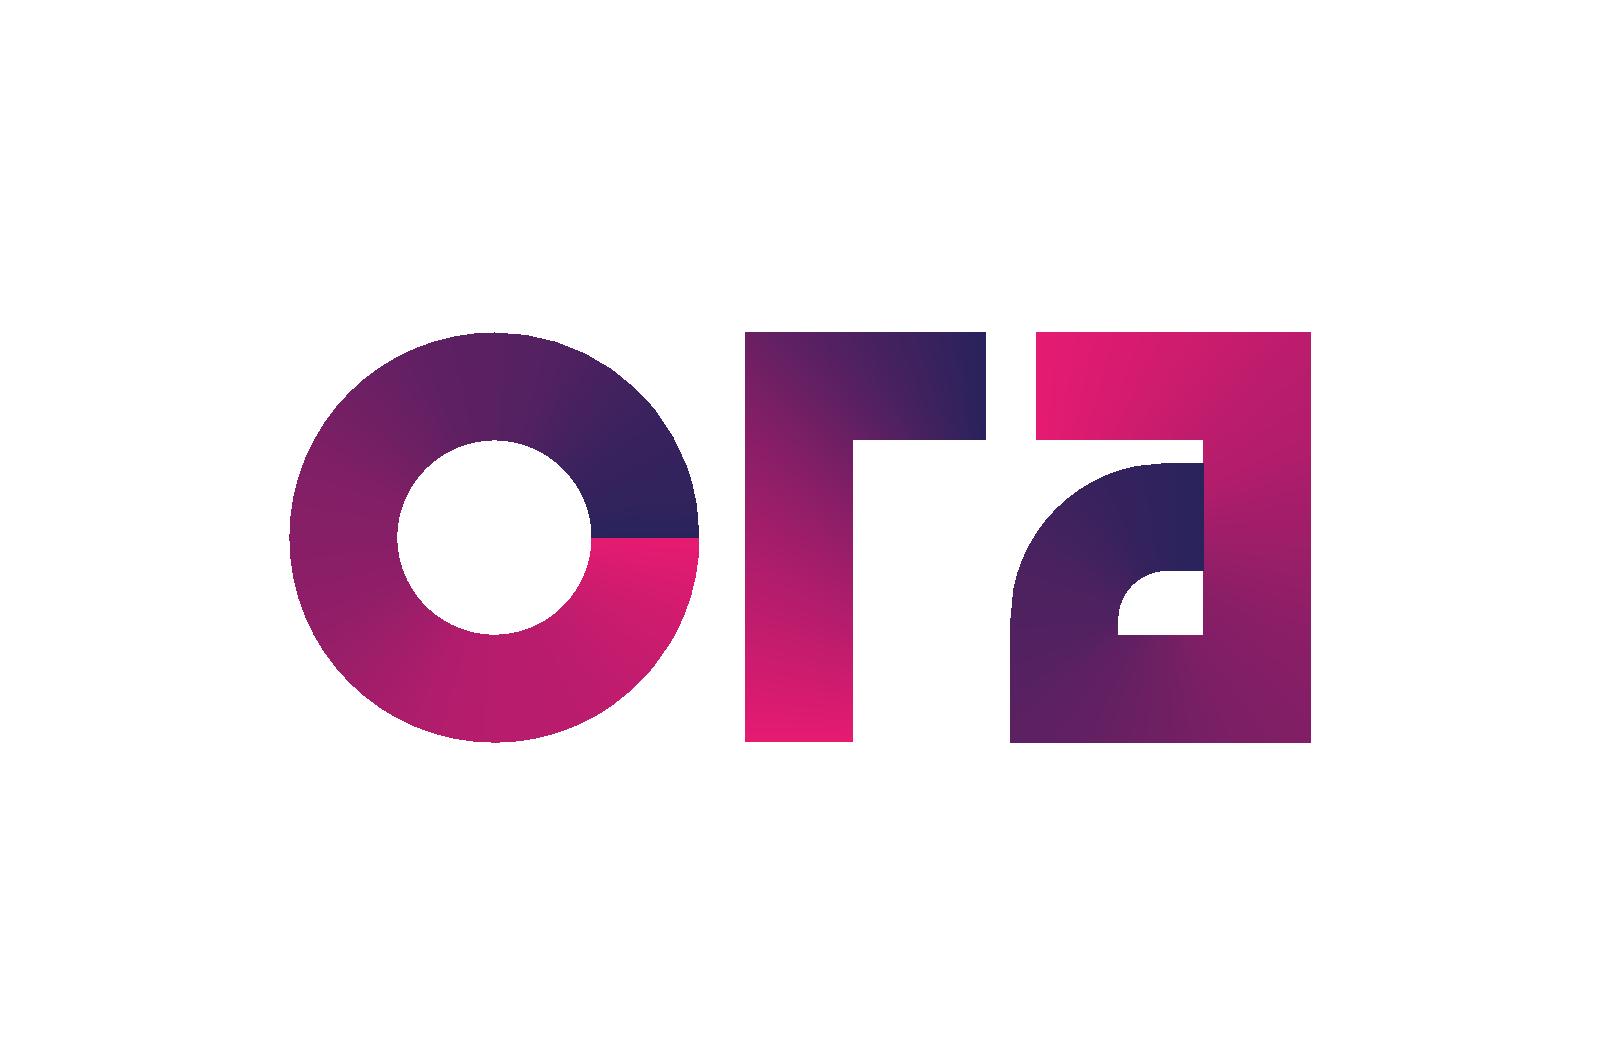 Ora - lezardscreation-ora-violet - 15